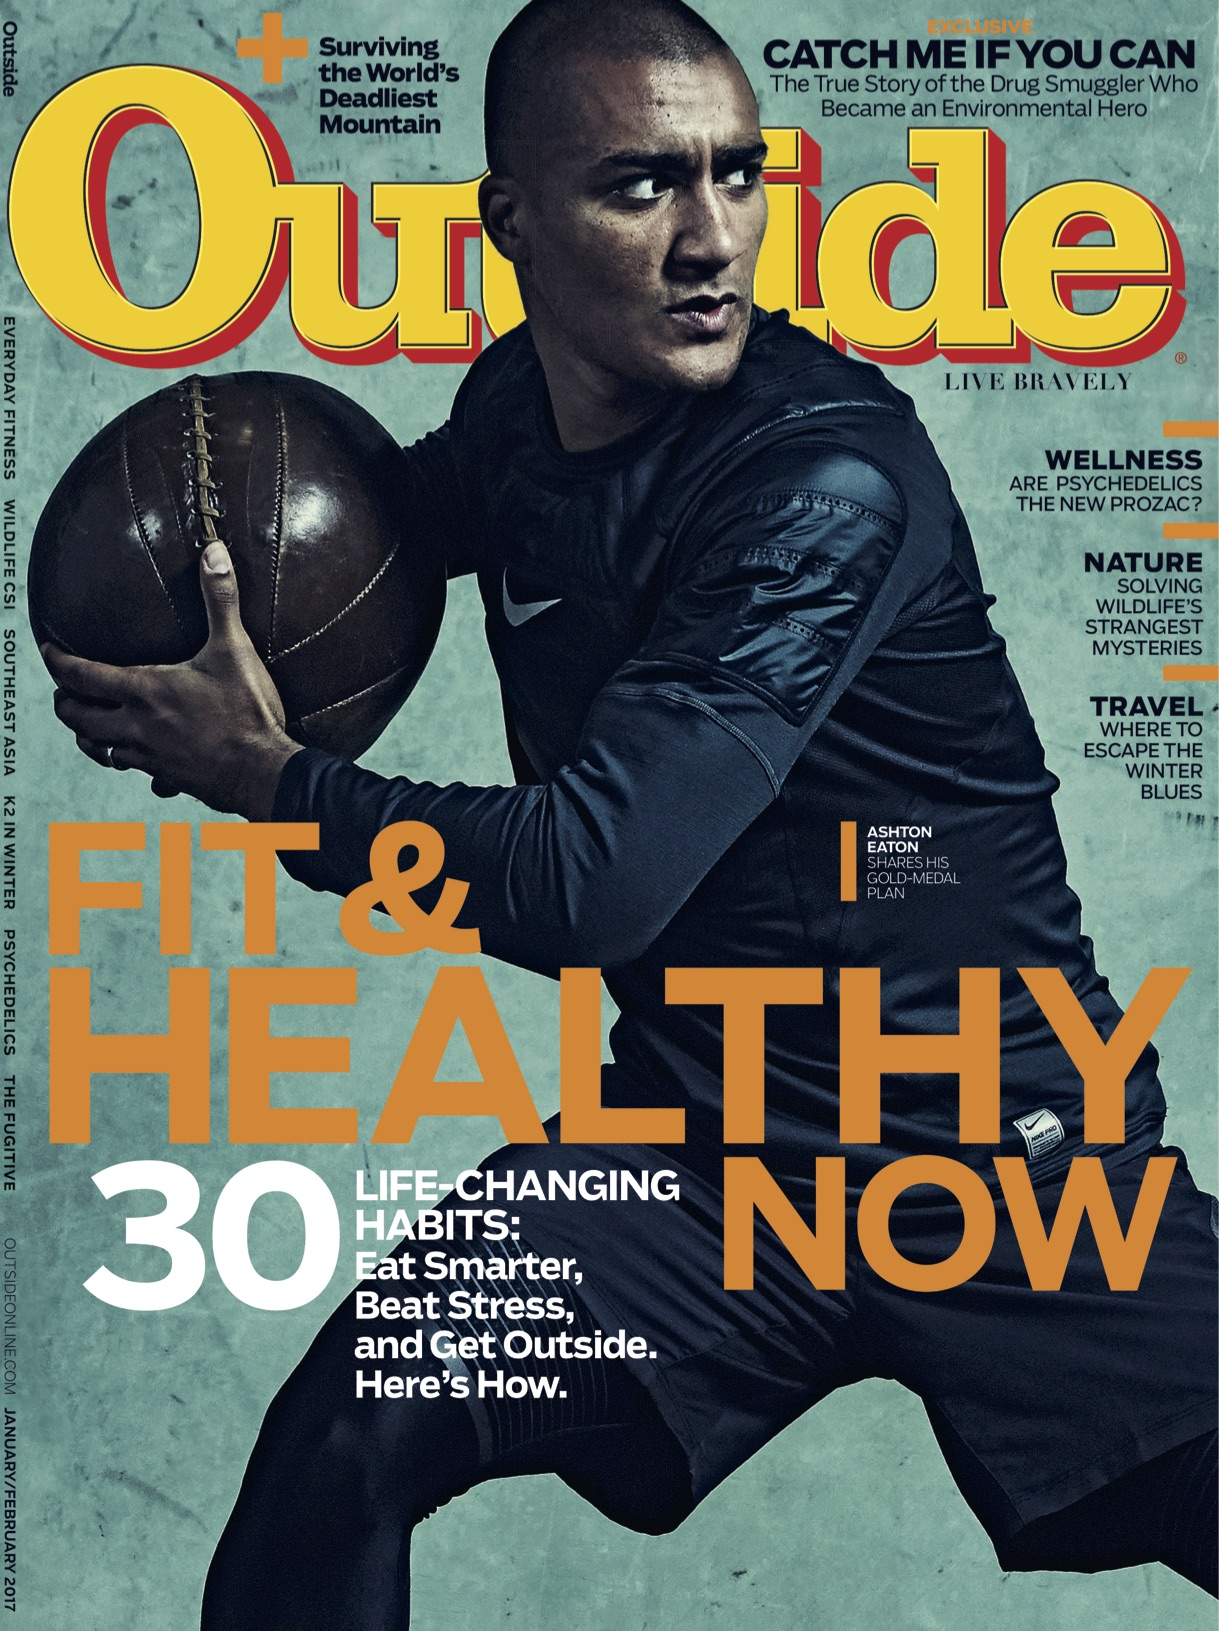 victoria-mesenbrink-ashton-eaton-outside-magazine-cover-jan.jpg